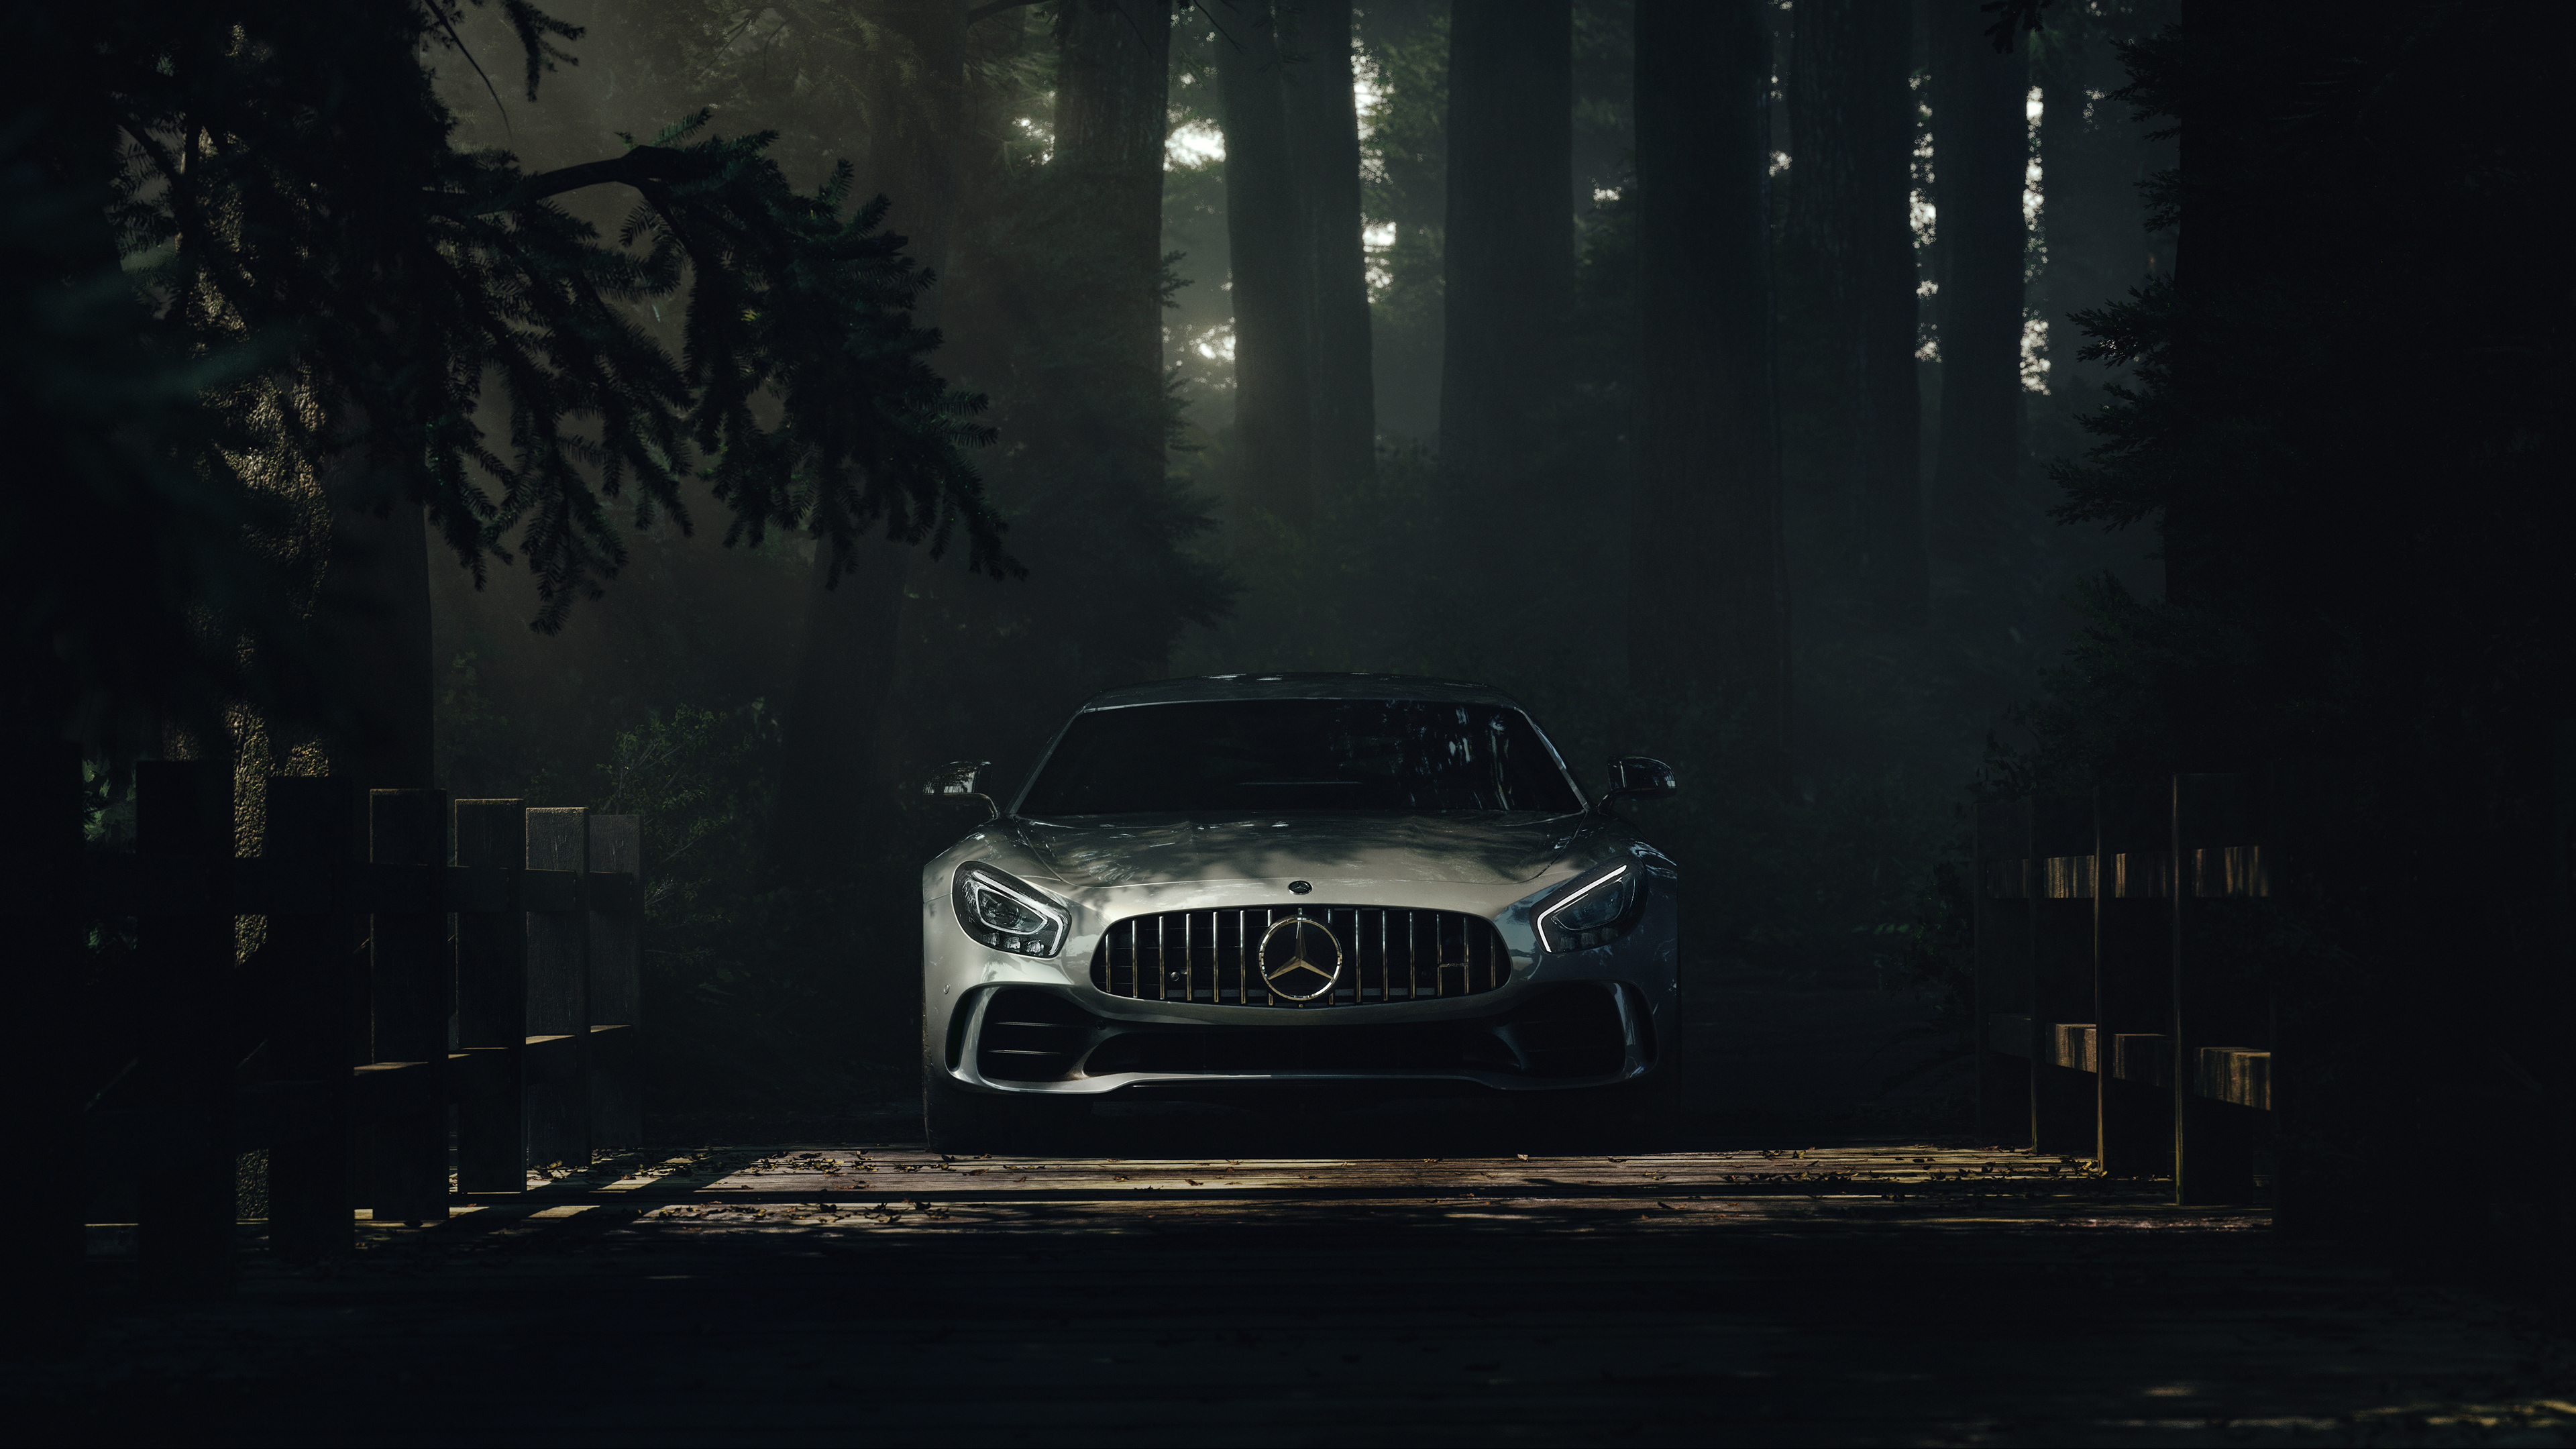 Mercedes Benz Amg Gt Deep Forest Hd Cars 4k Wallpapers